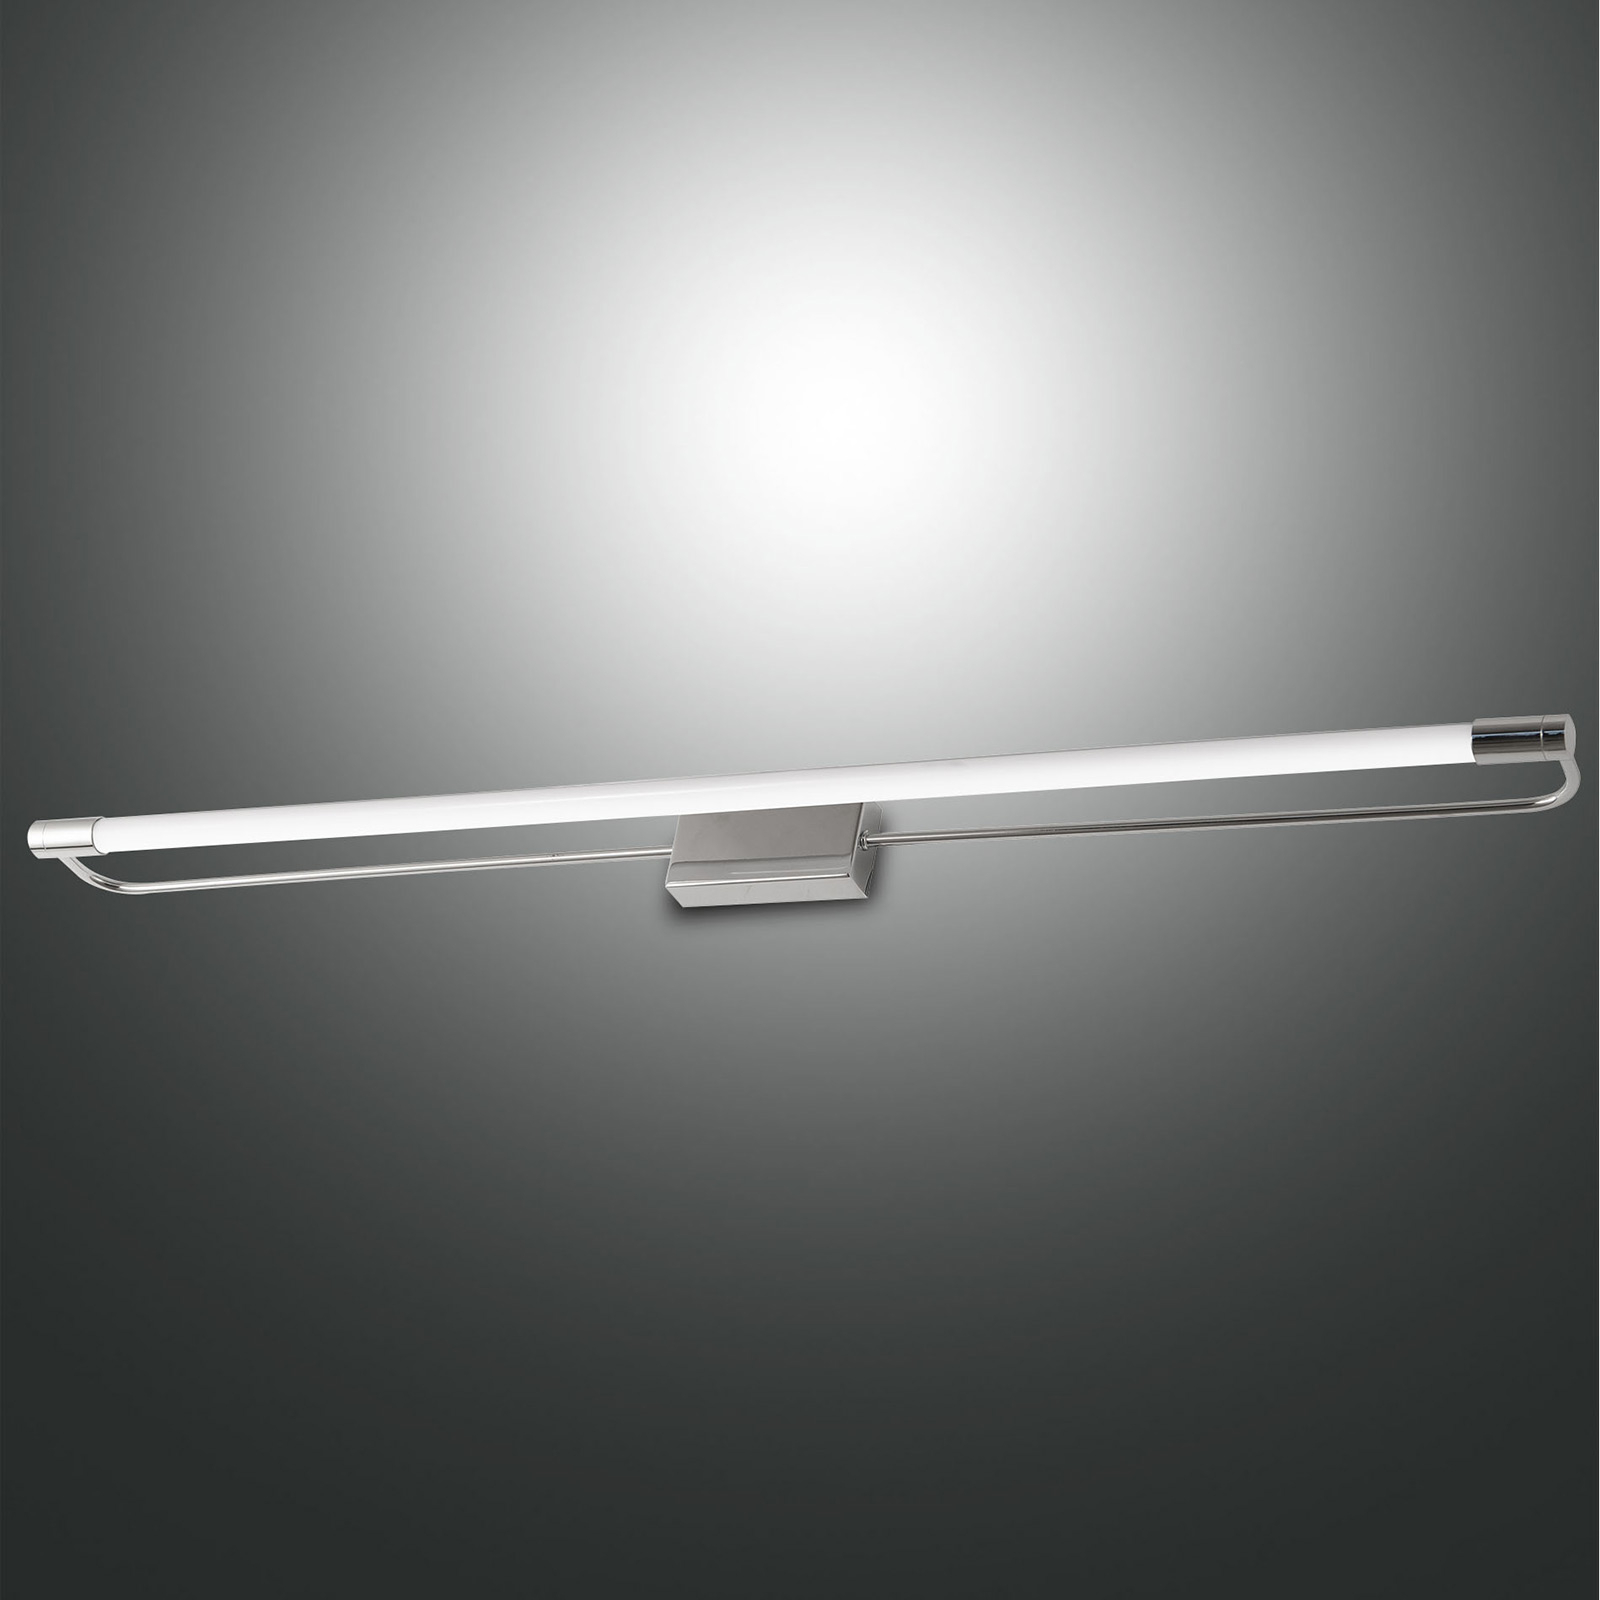 LED wandlamp Rapallo, chroom, IP44, 80 cm